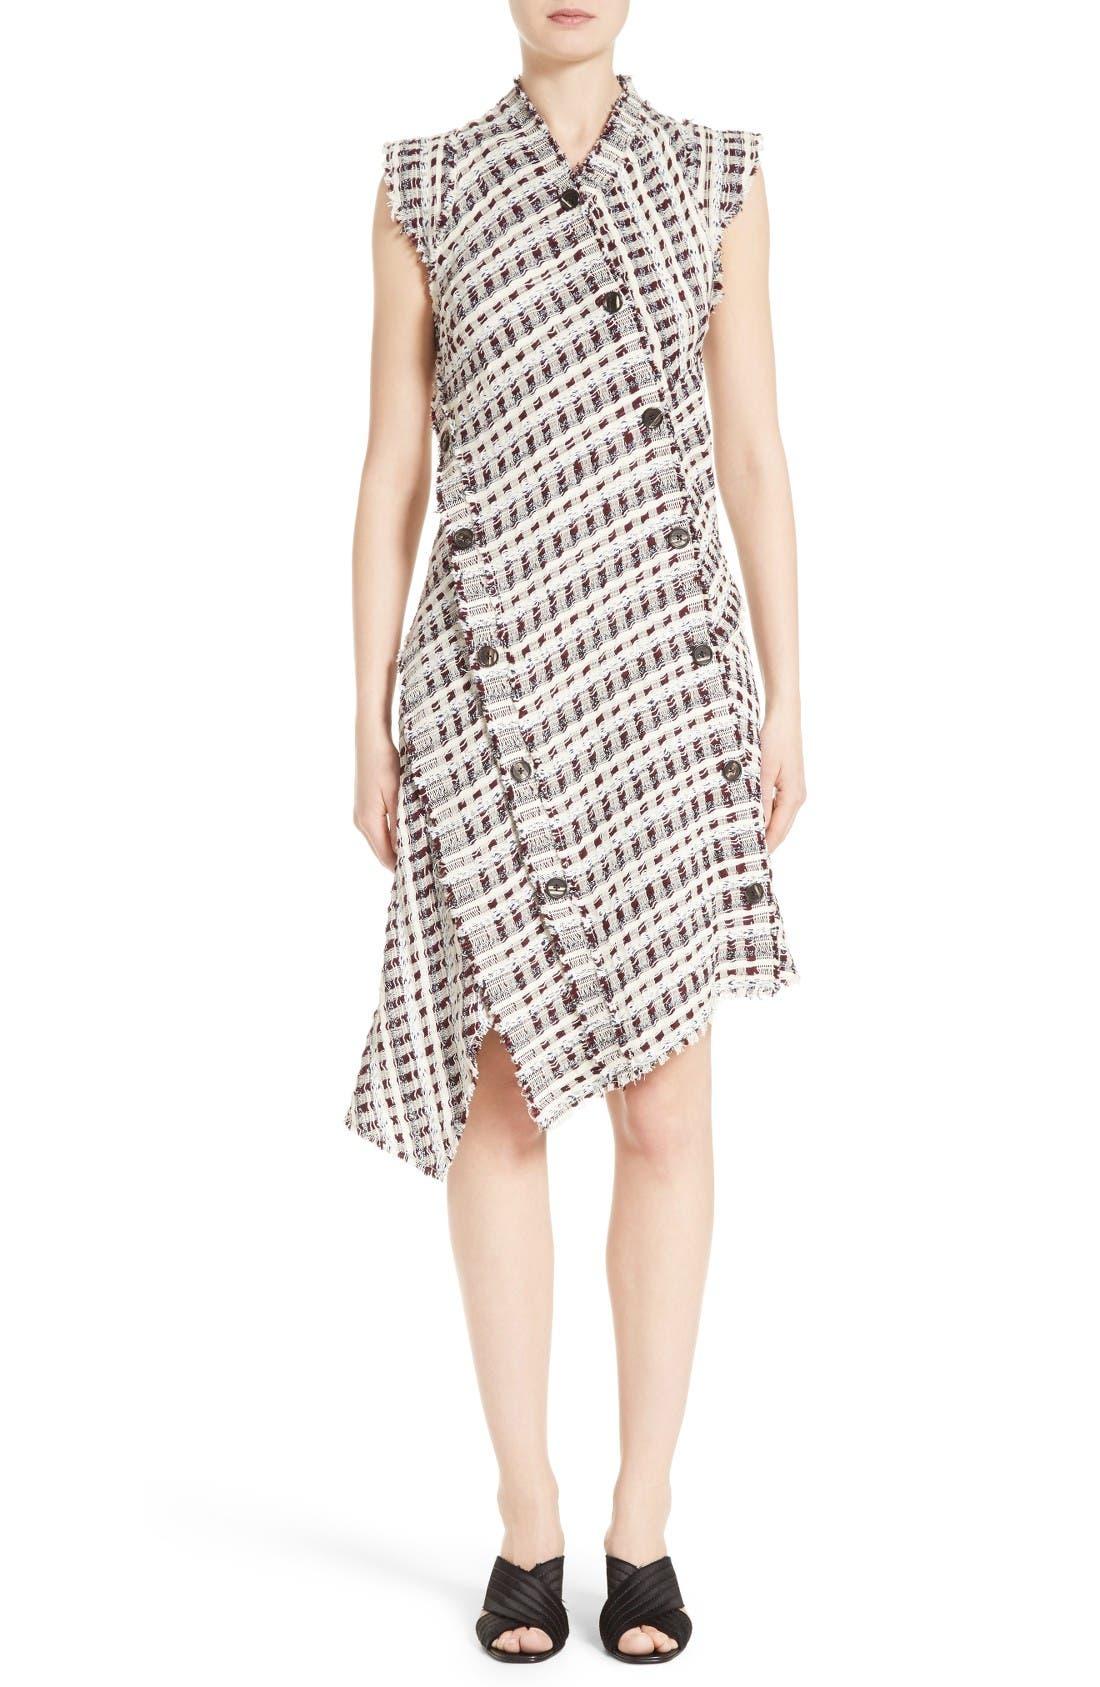 Main Image - Proenza Schouler Asymmetrical Tweed Dress